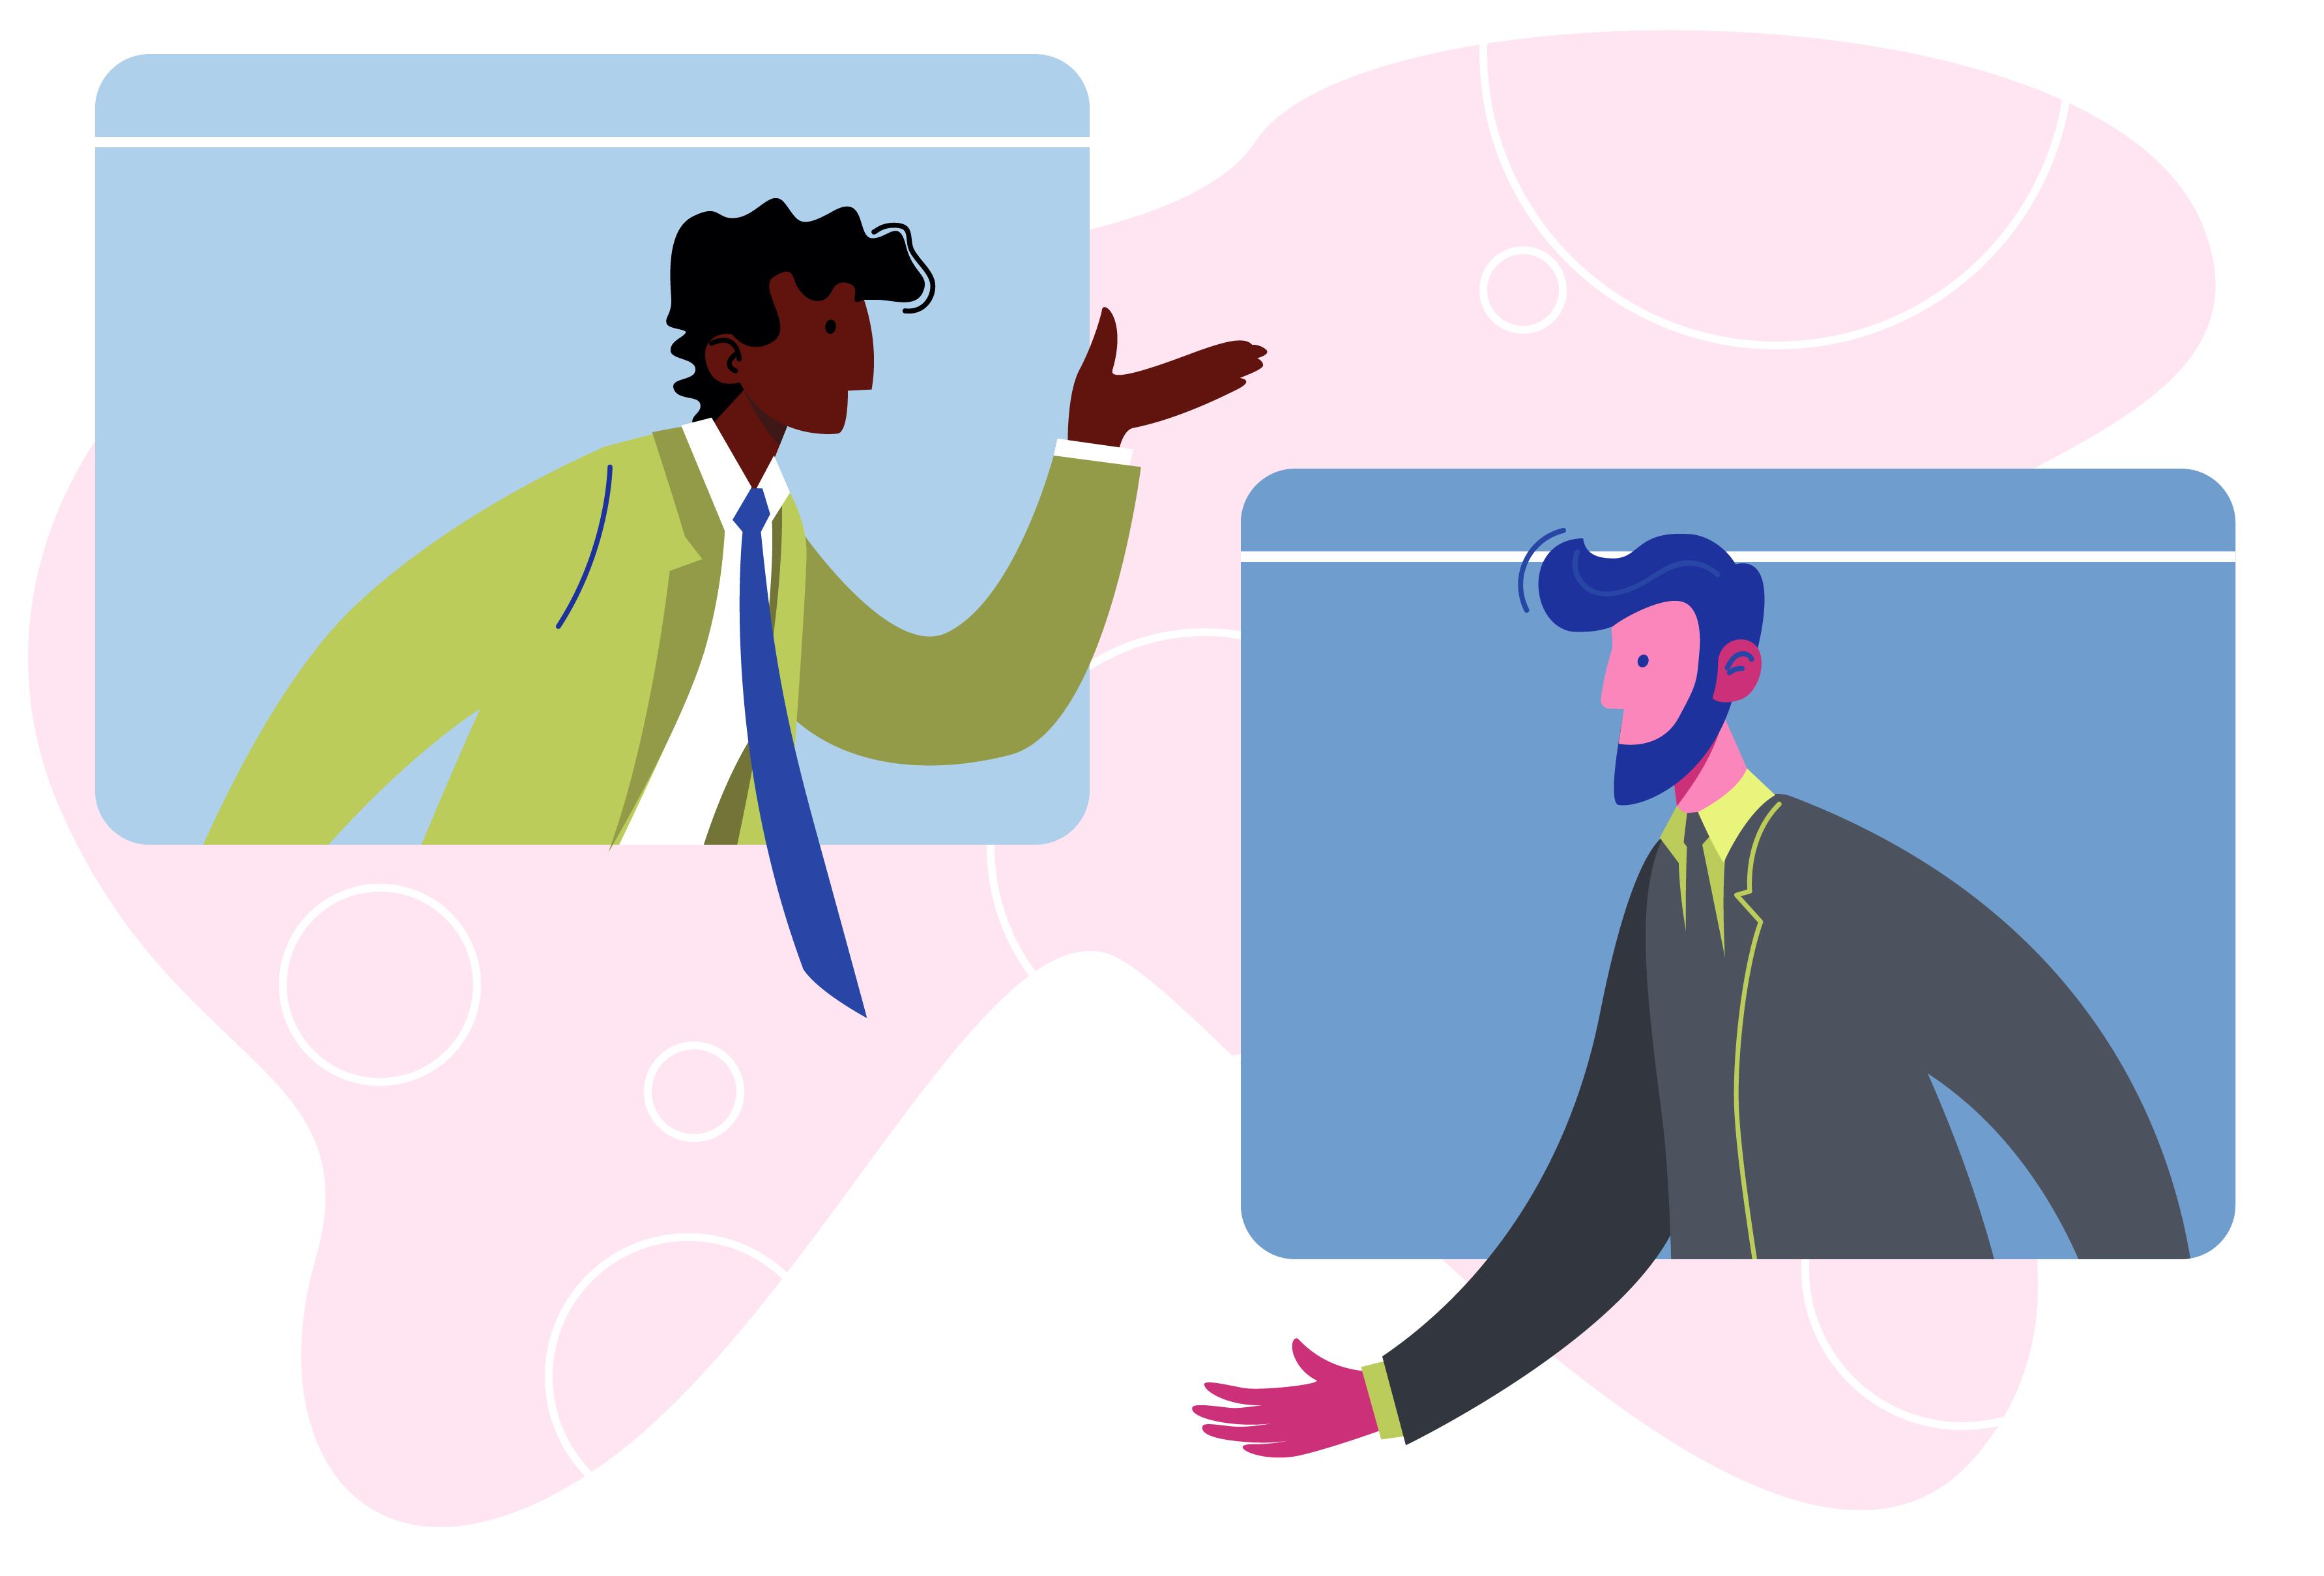 Conflict between remote employees